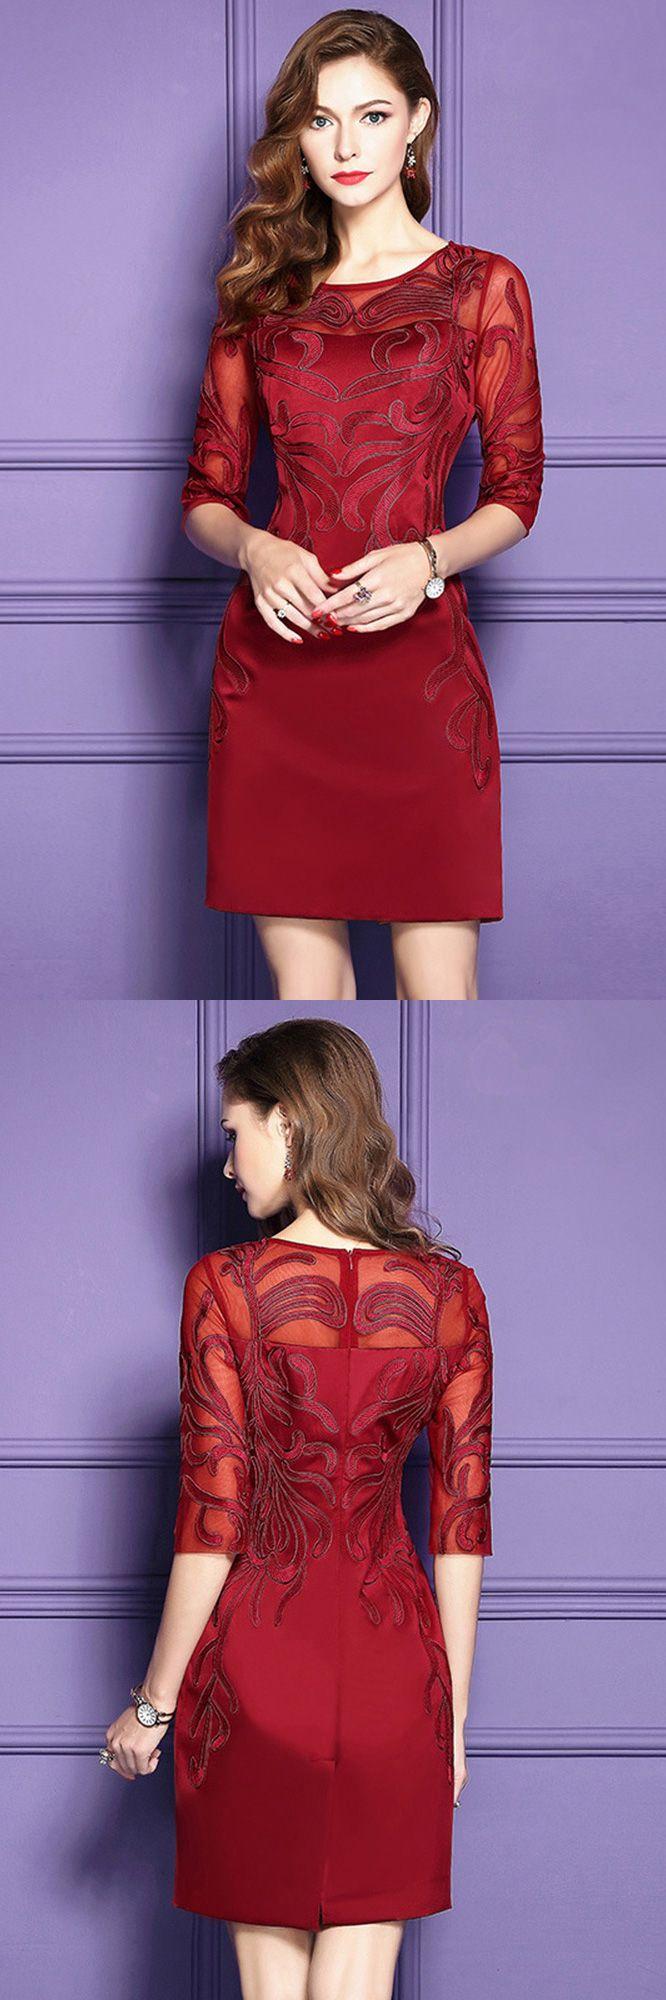 Only 76.99, Wedding Guest Dresses Burgundy Half Sleeve